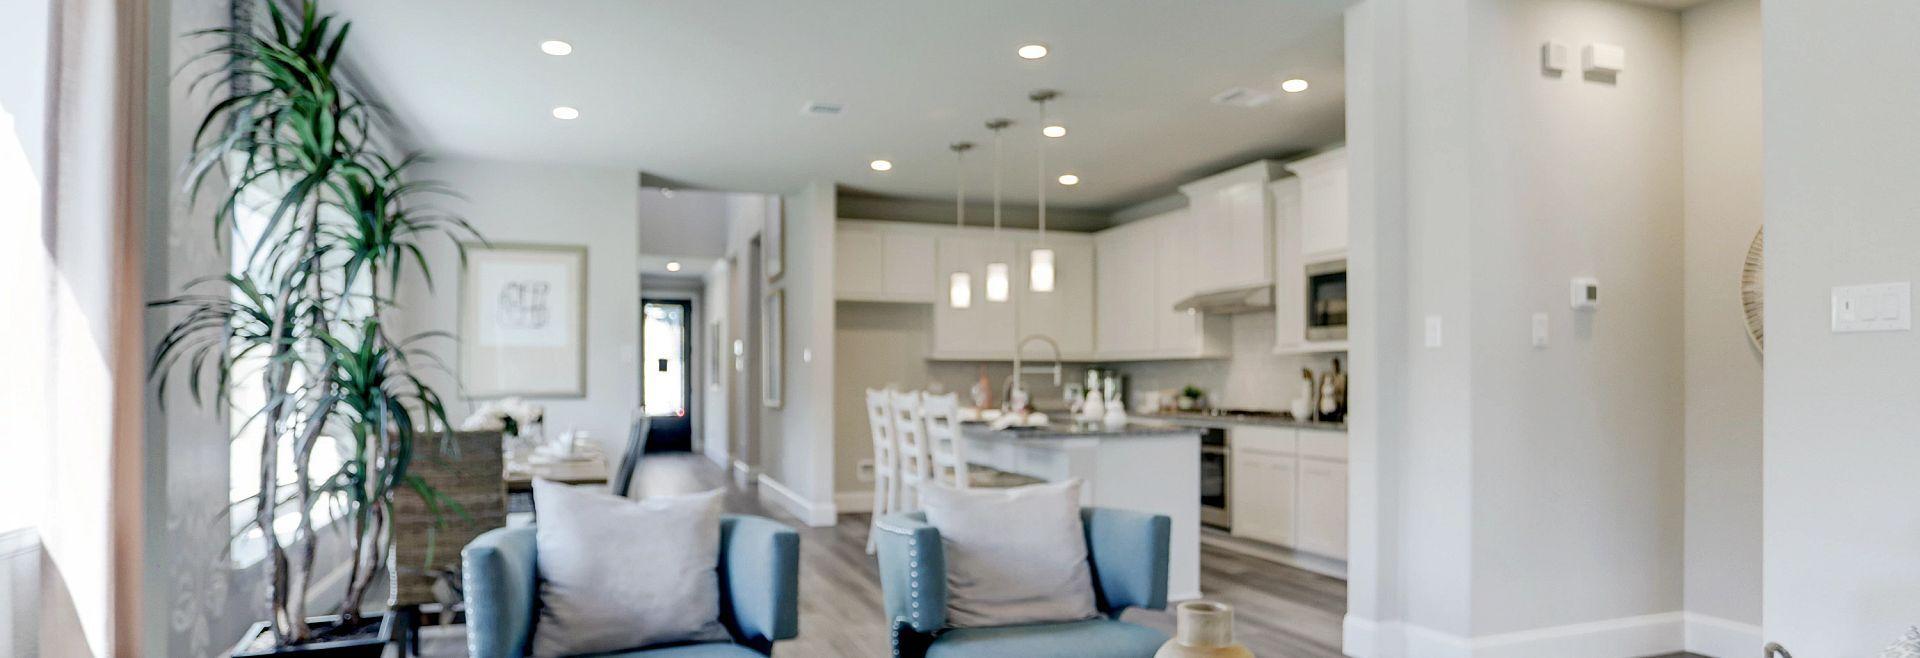 Harmony 40 Plan 3059 Living Room:Harmony 40 Model